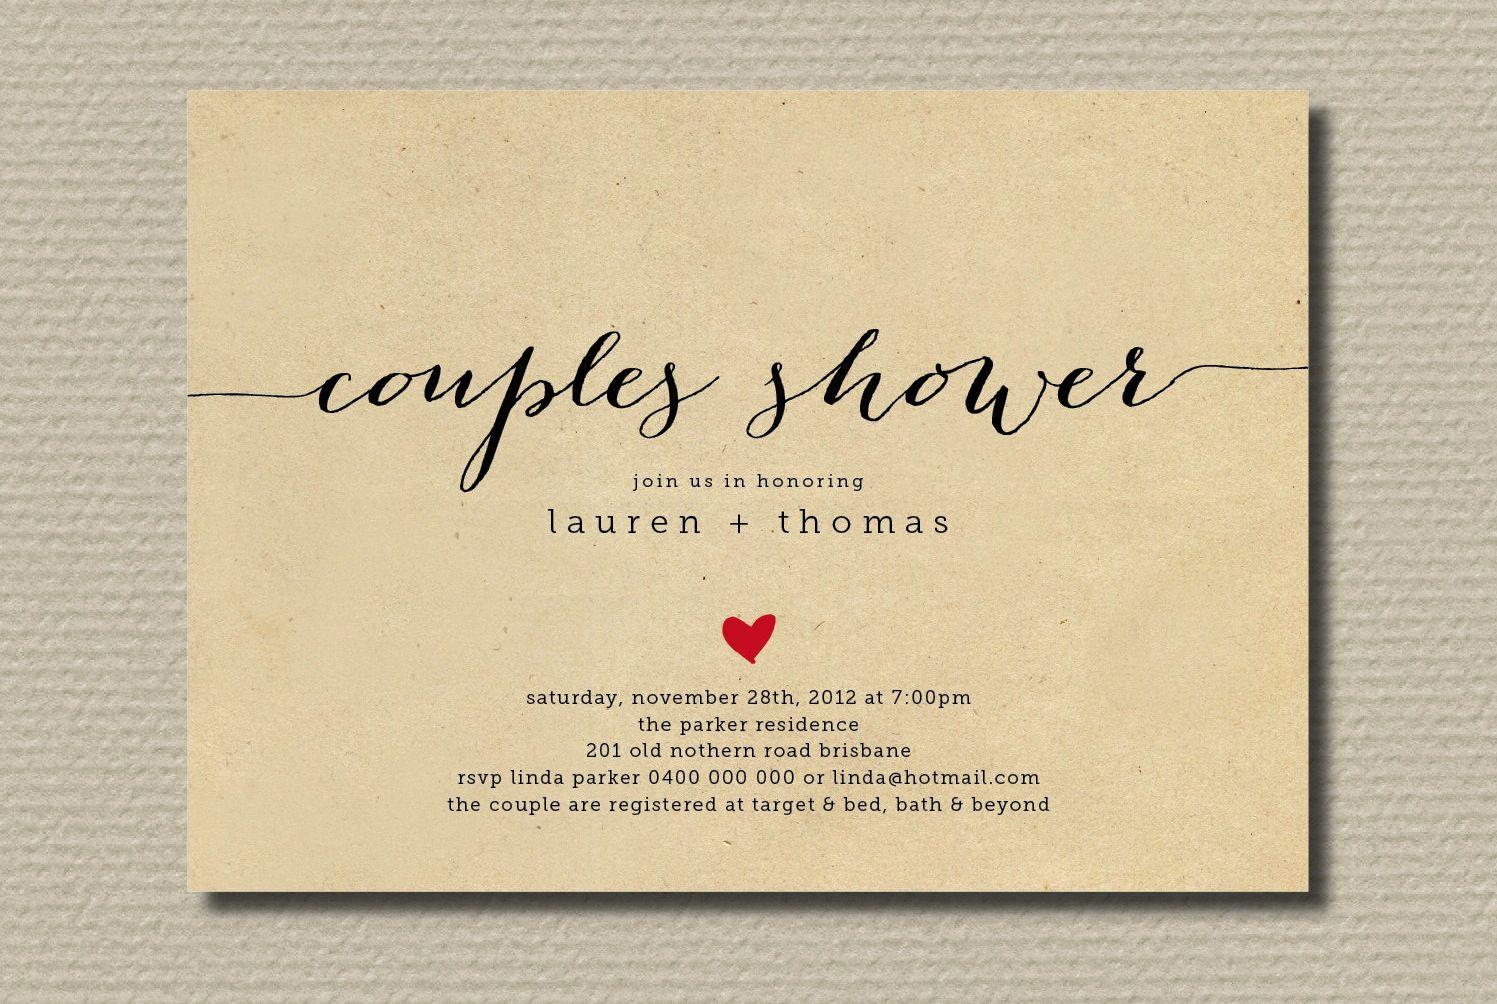 Ordinaire Couples Wedding Shower Invitations | Simple Wedding Shower Invitation  Couples With Heart | OneWed.com